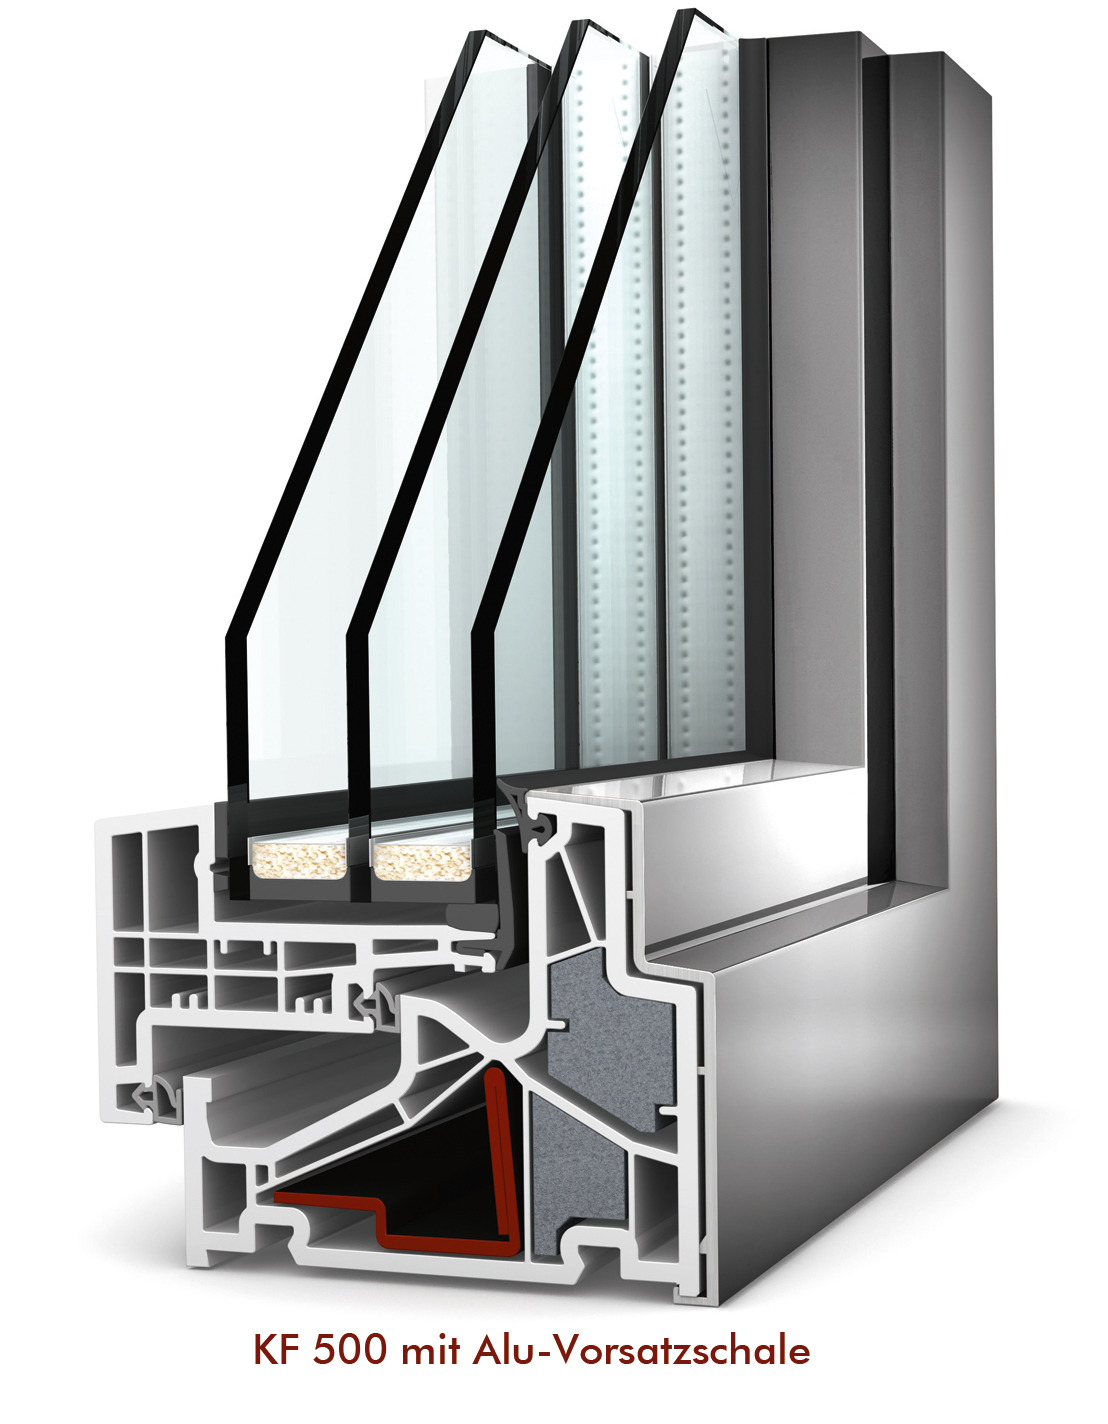 die neue fenster generation bei metallbau hunold aus olpe. Black Bedroom Furniture Sets. Home Design Ideas